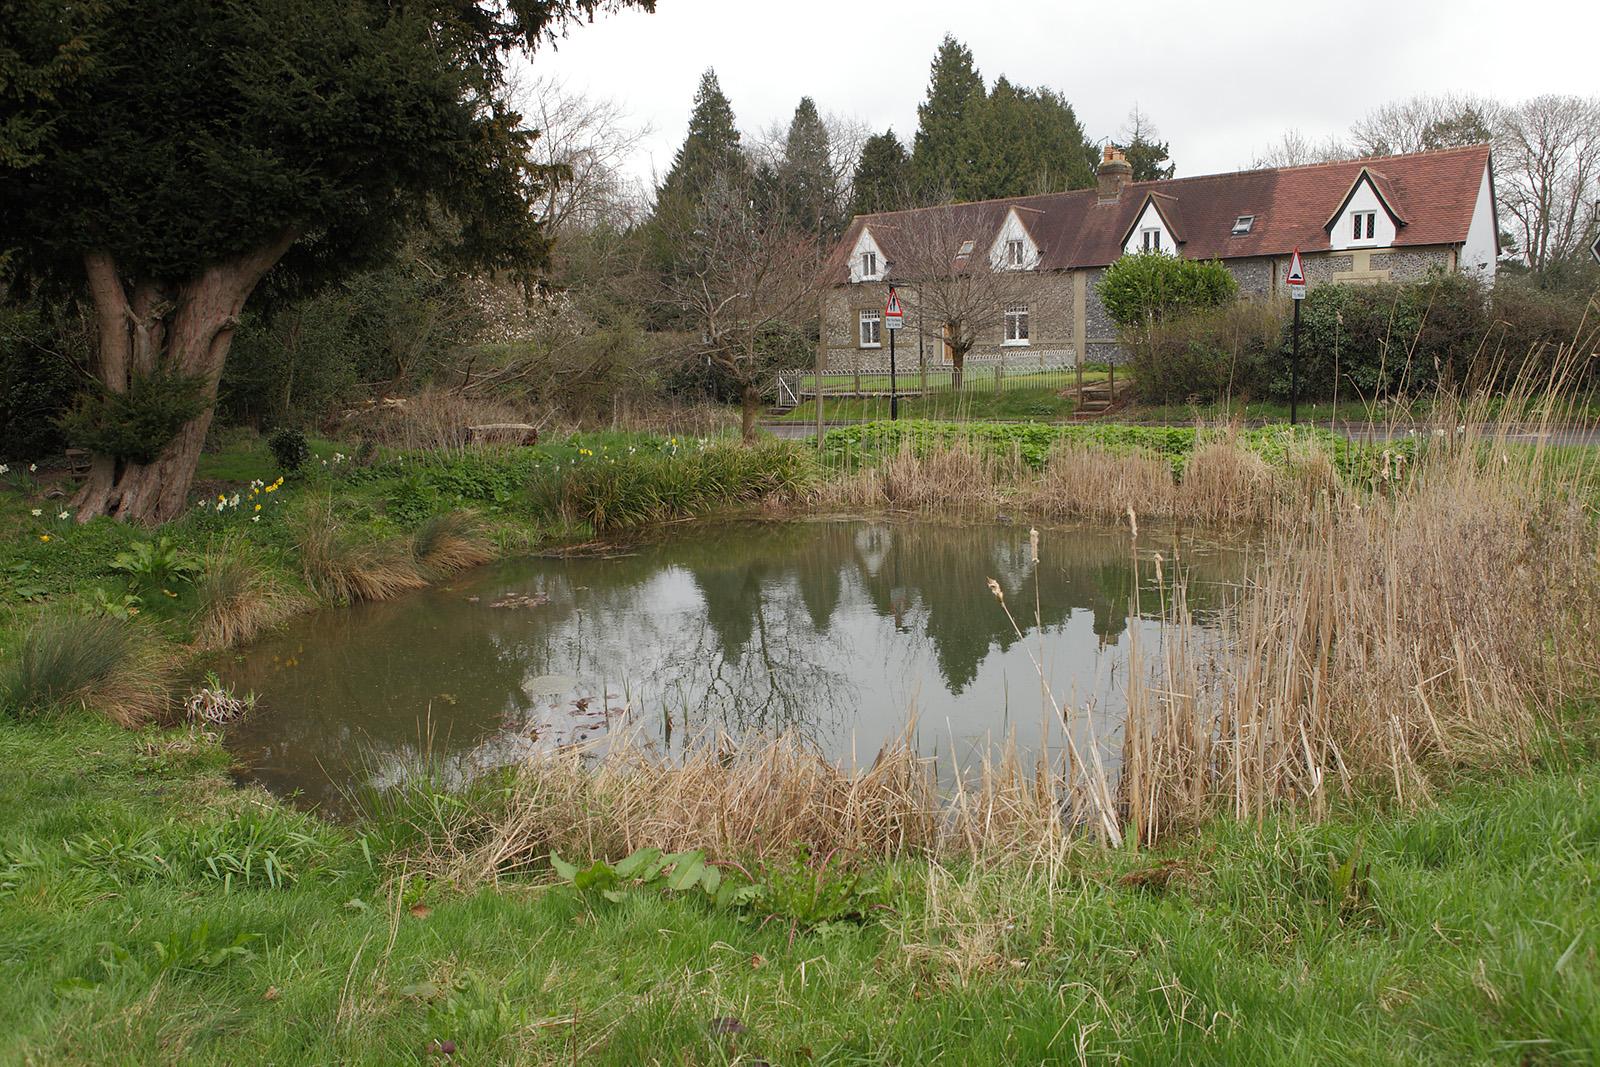 20170323_Croydon_Wattenden-Pond_View